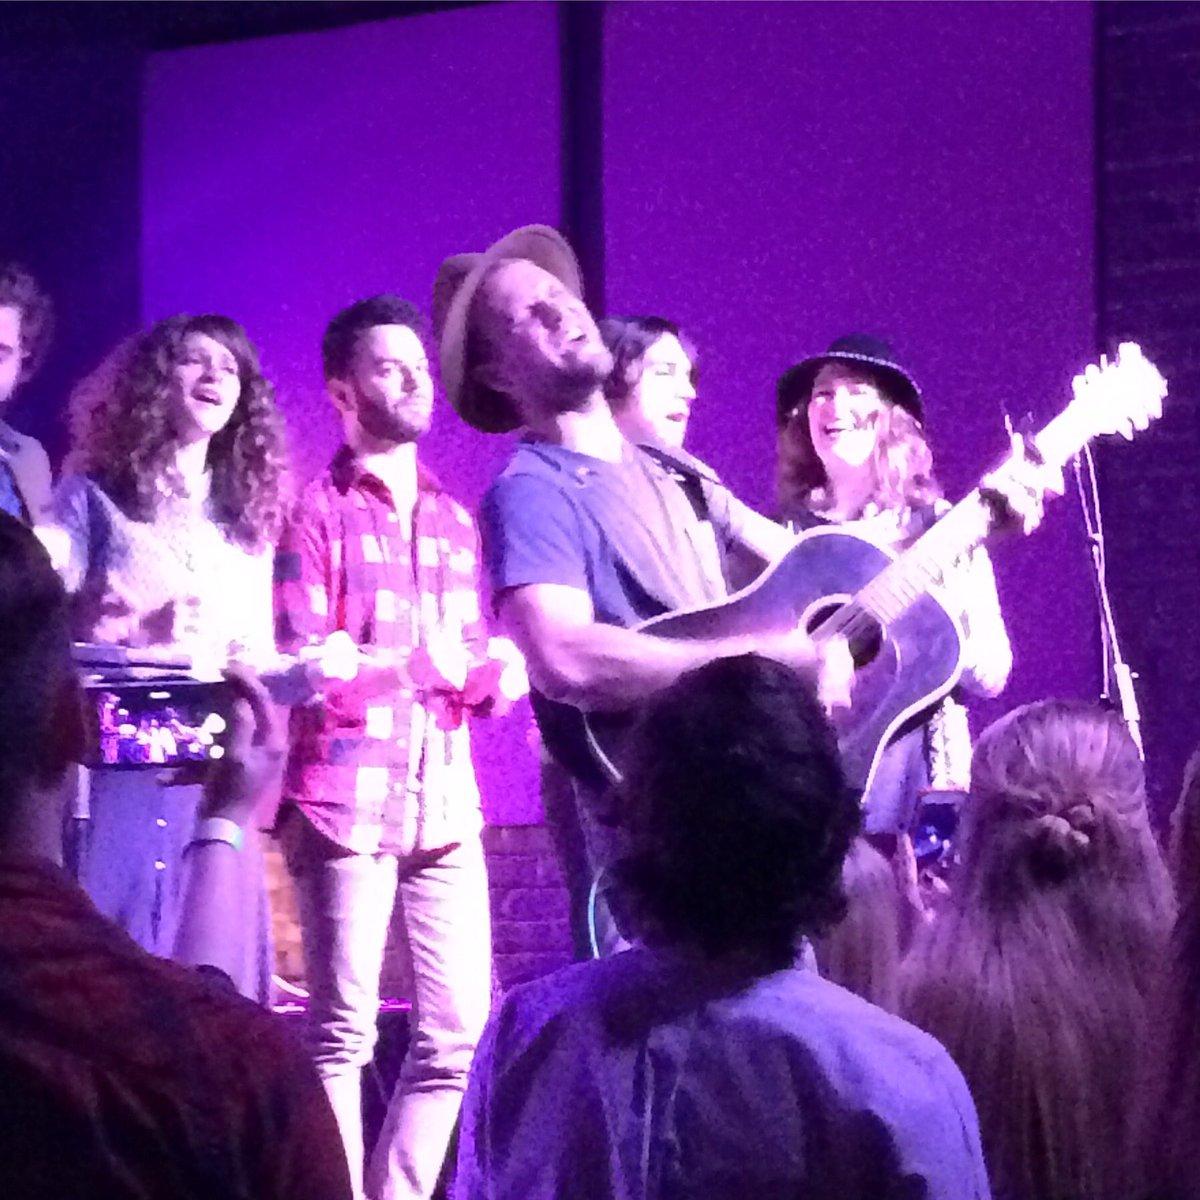 Andrew Ripp Revelry Room Chattanooga Tn On 2 19 2016